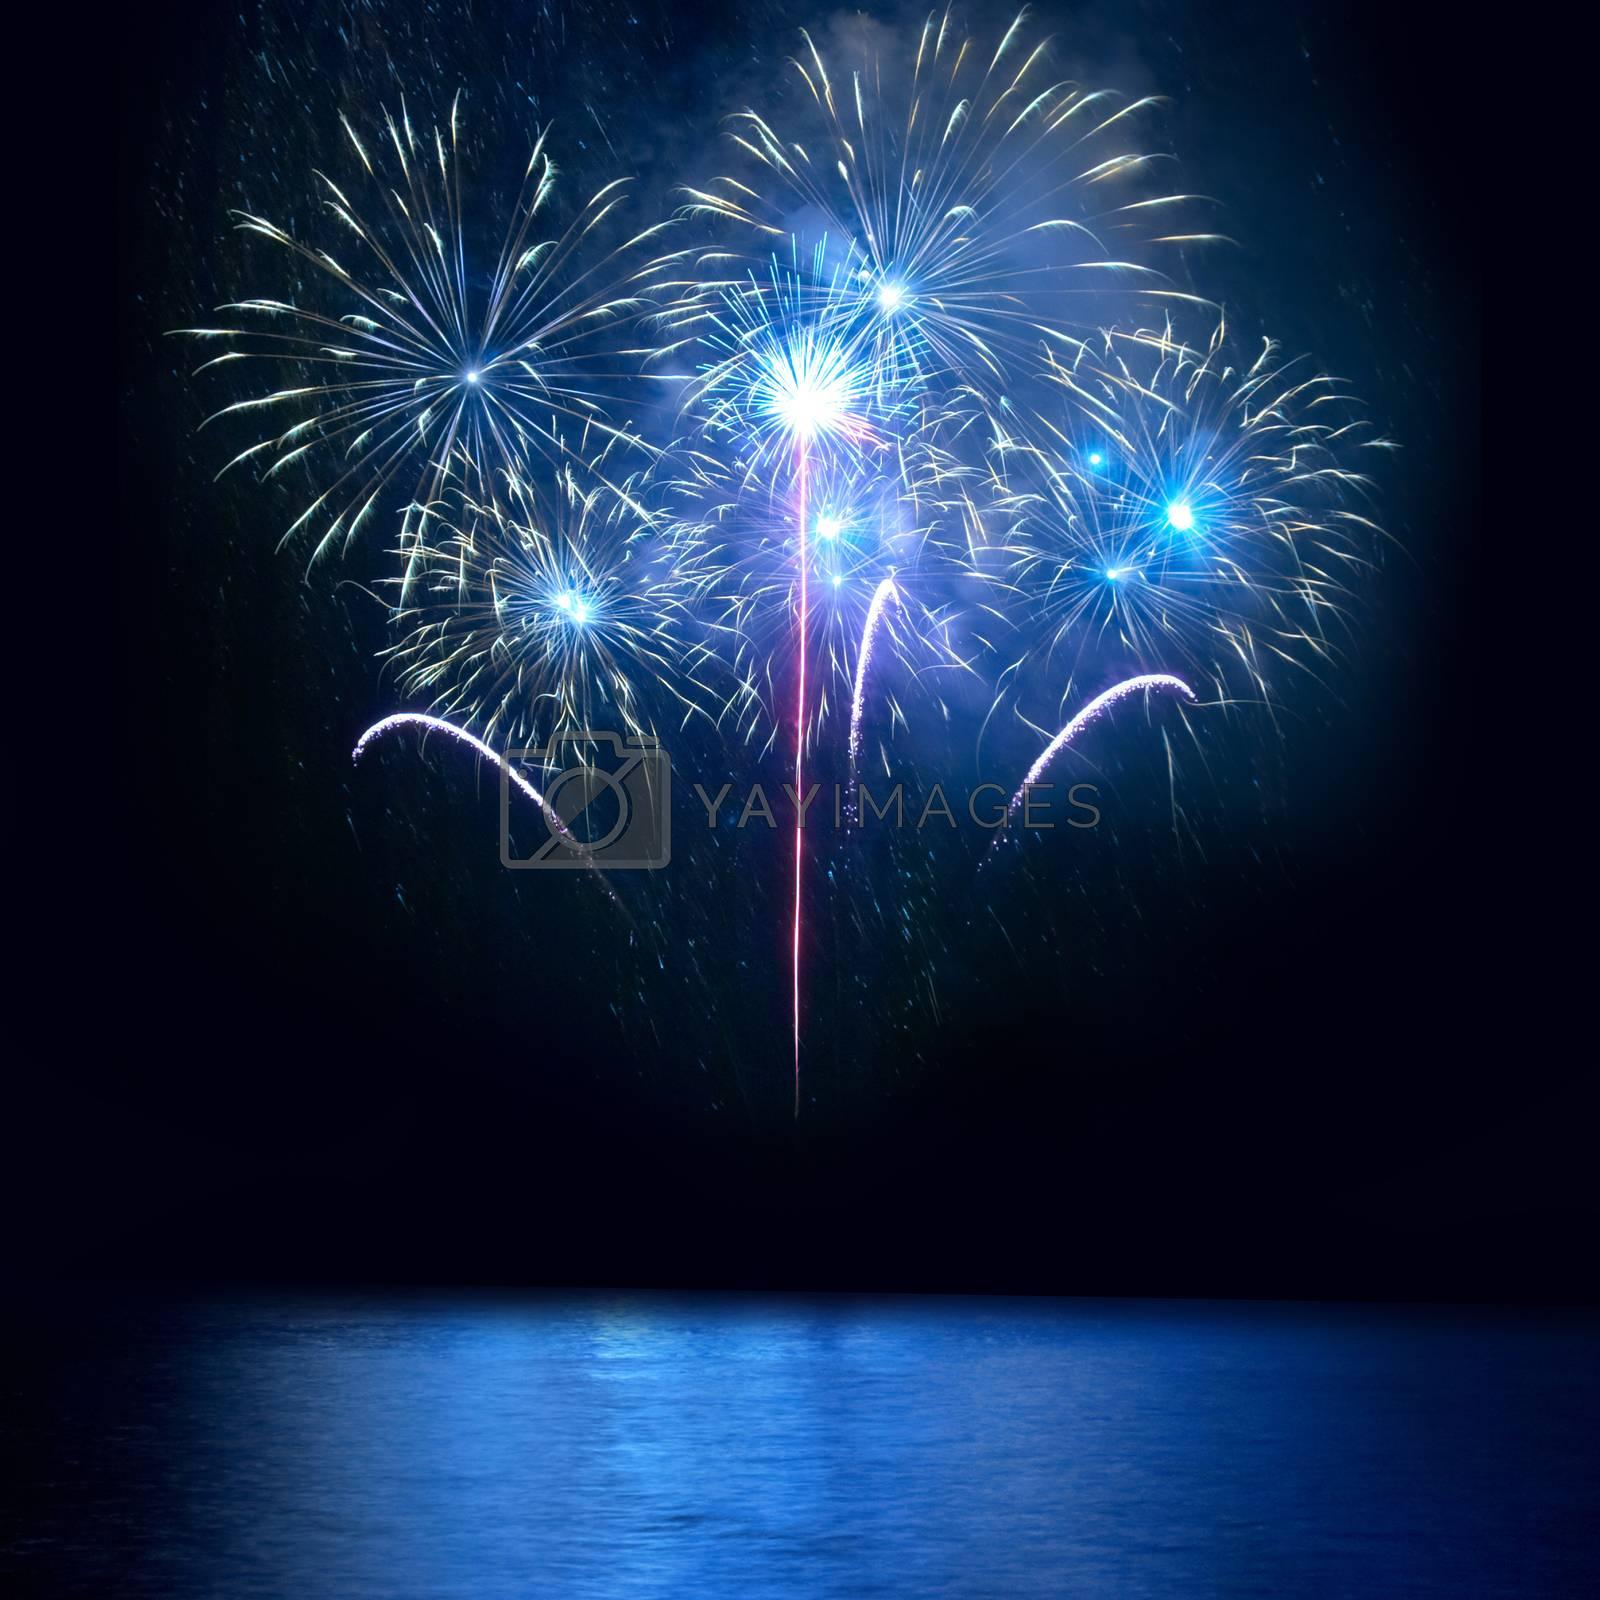 Blue fireworks by vapi